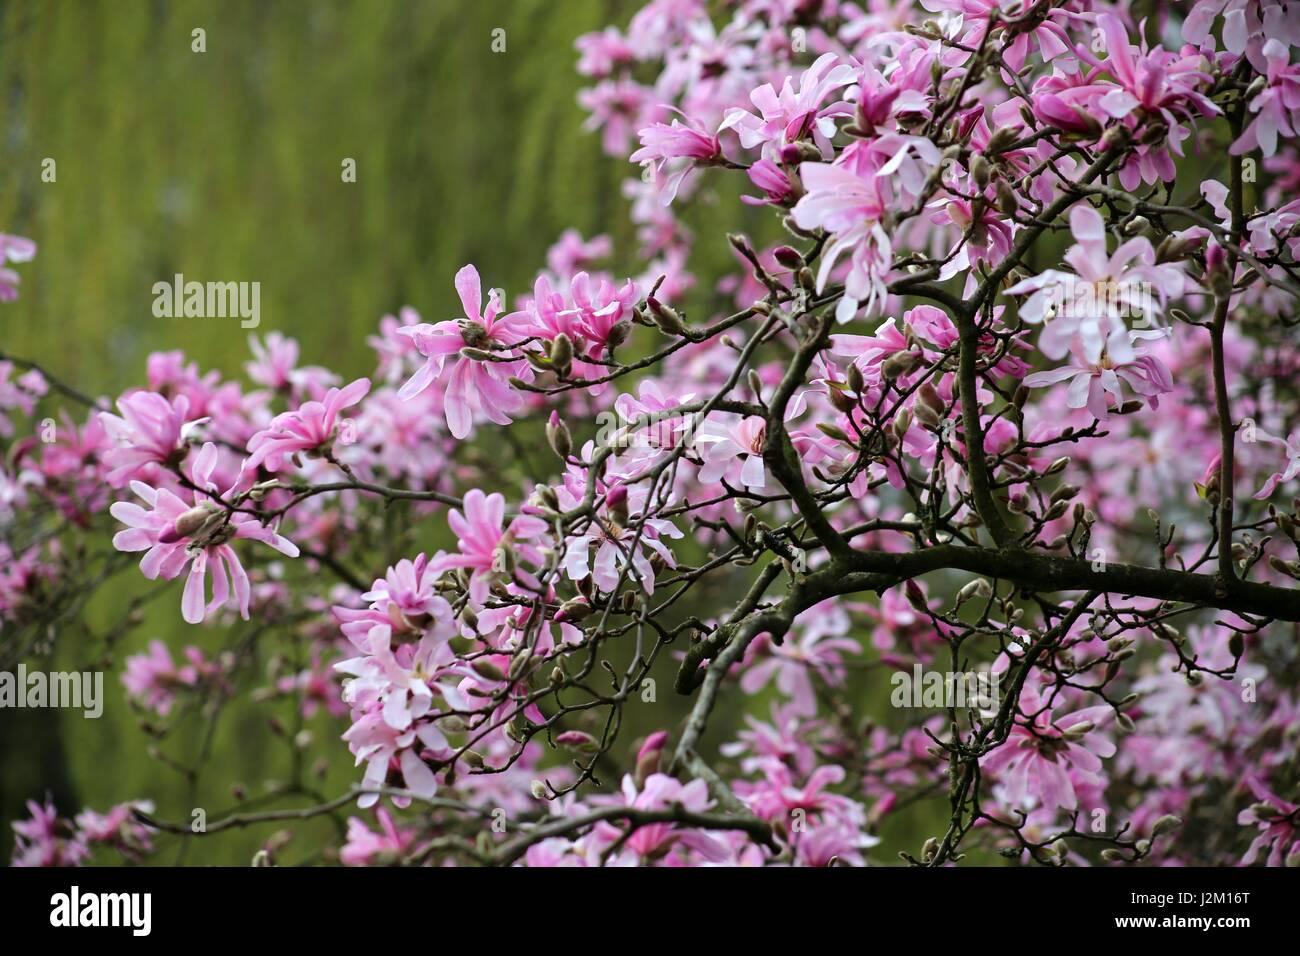 Magnolia Loebneri Leonard Messel Pink Star Shaped Magnolia In